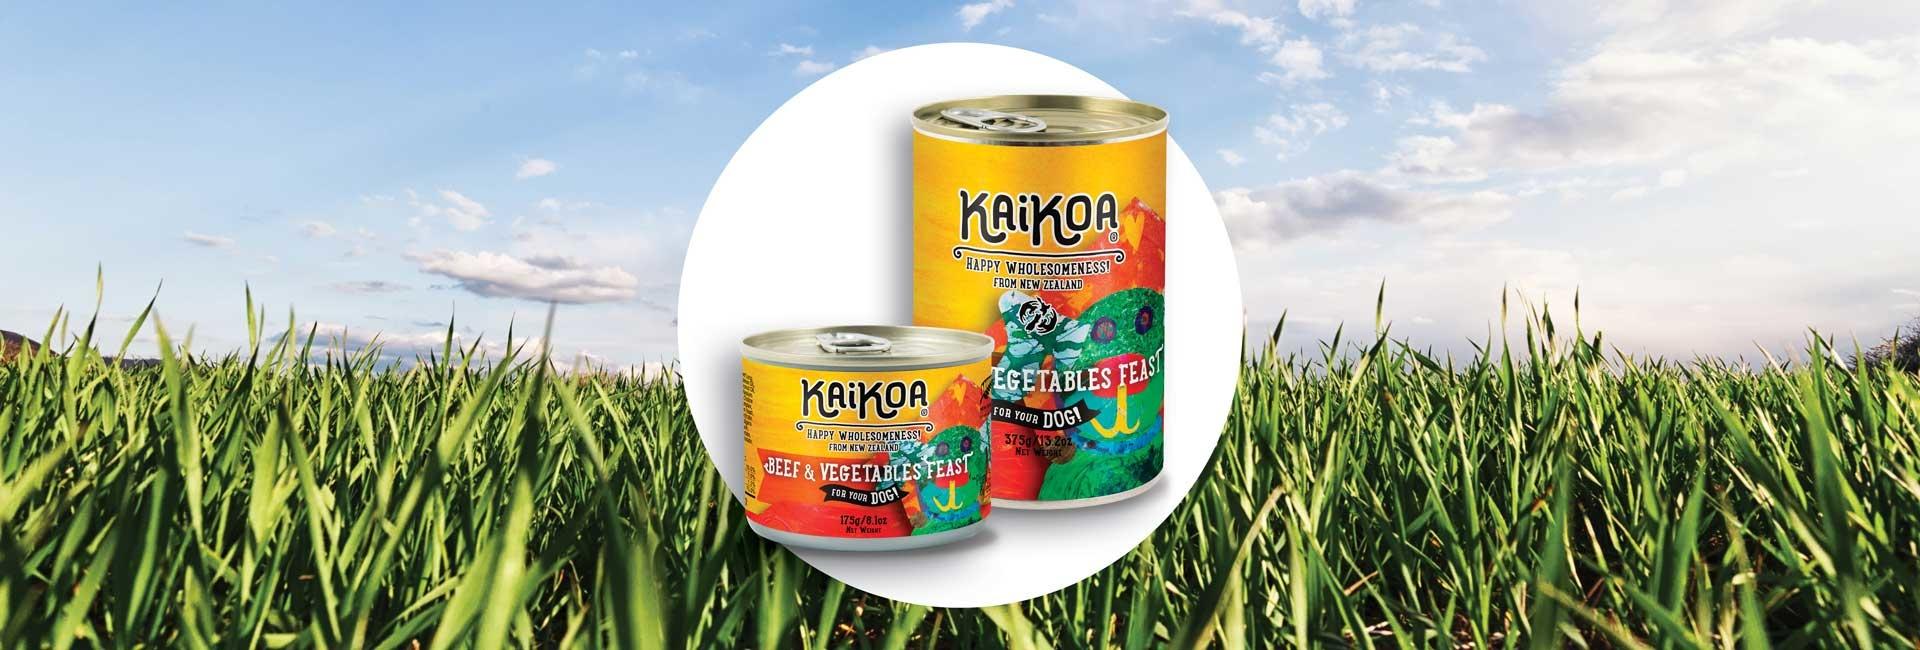 Kaikoa Dog Beef & Vegetable Feast Grain-Free Wet Dog Food, 13.2-oz, case of 12